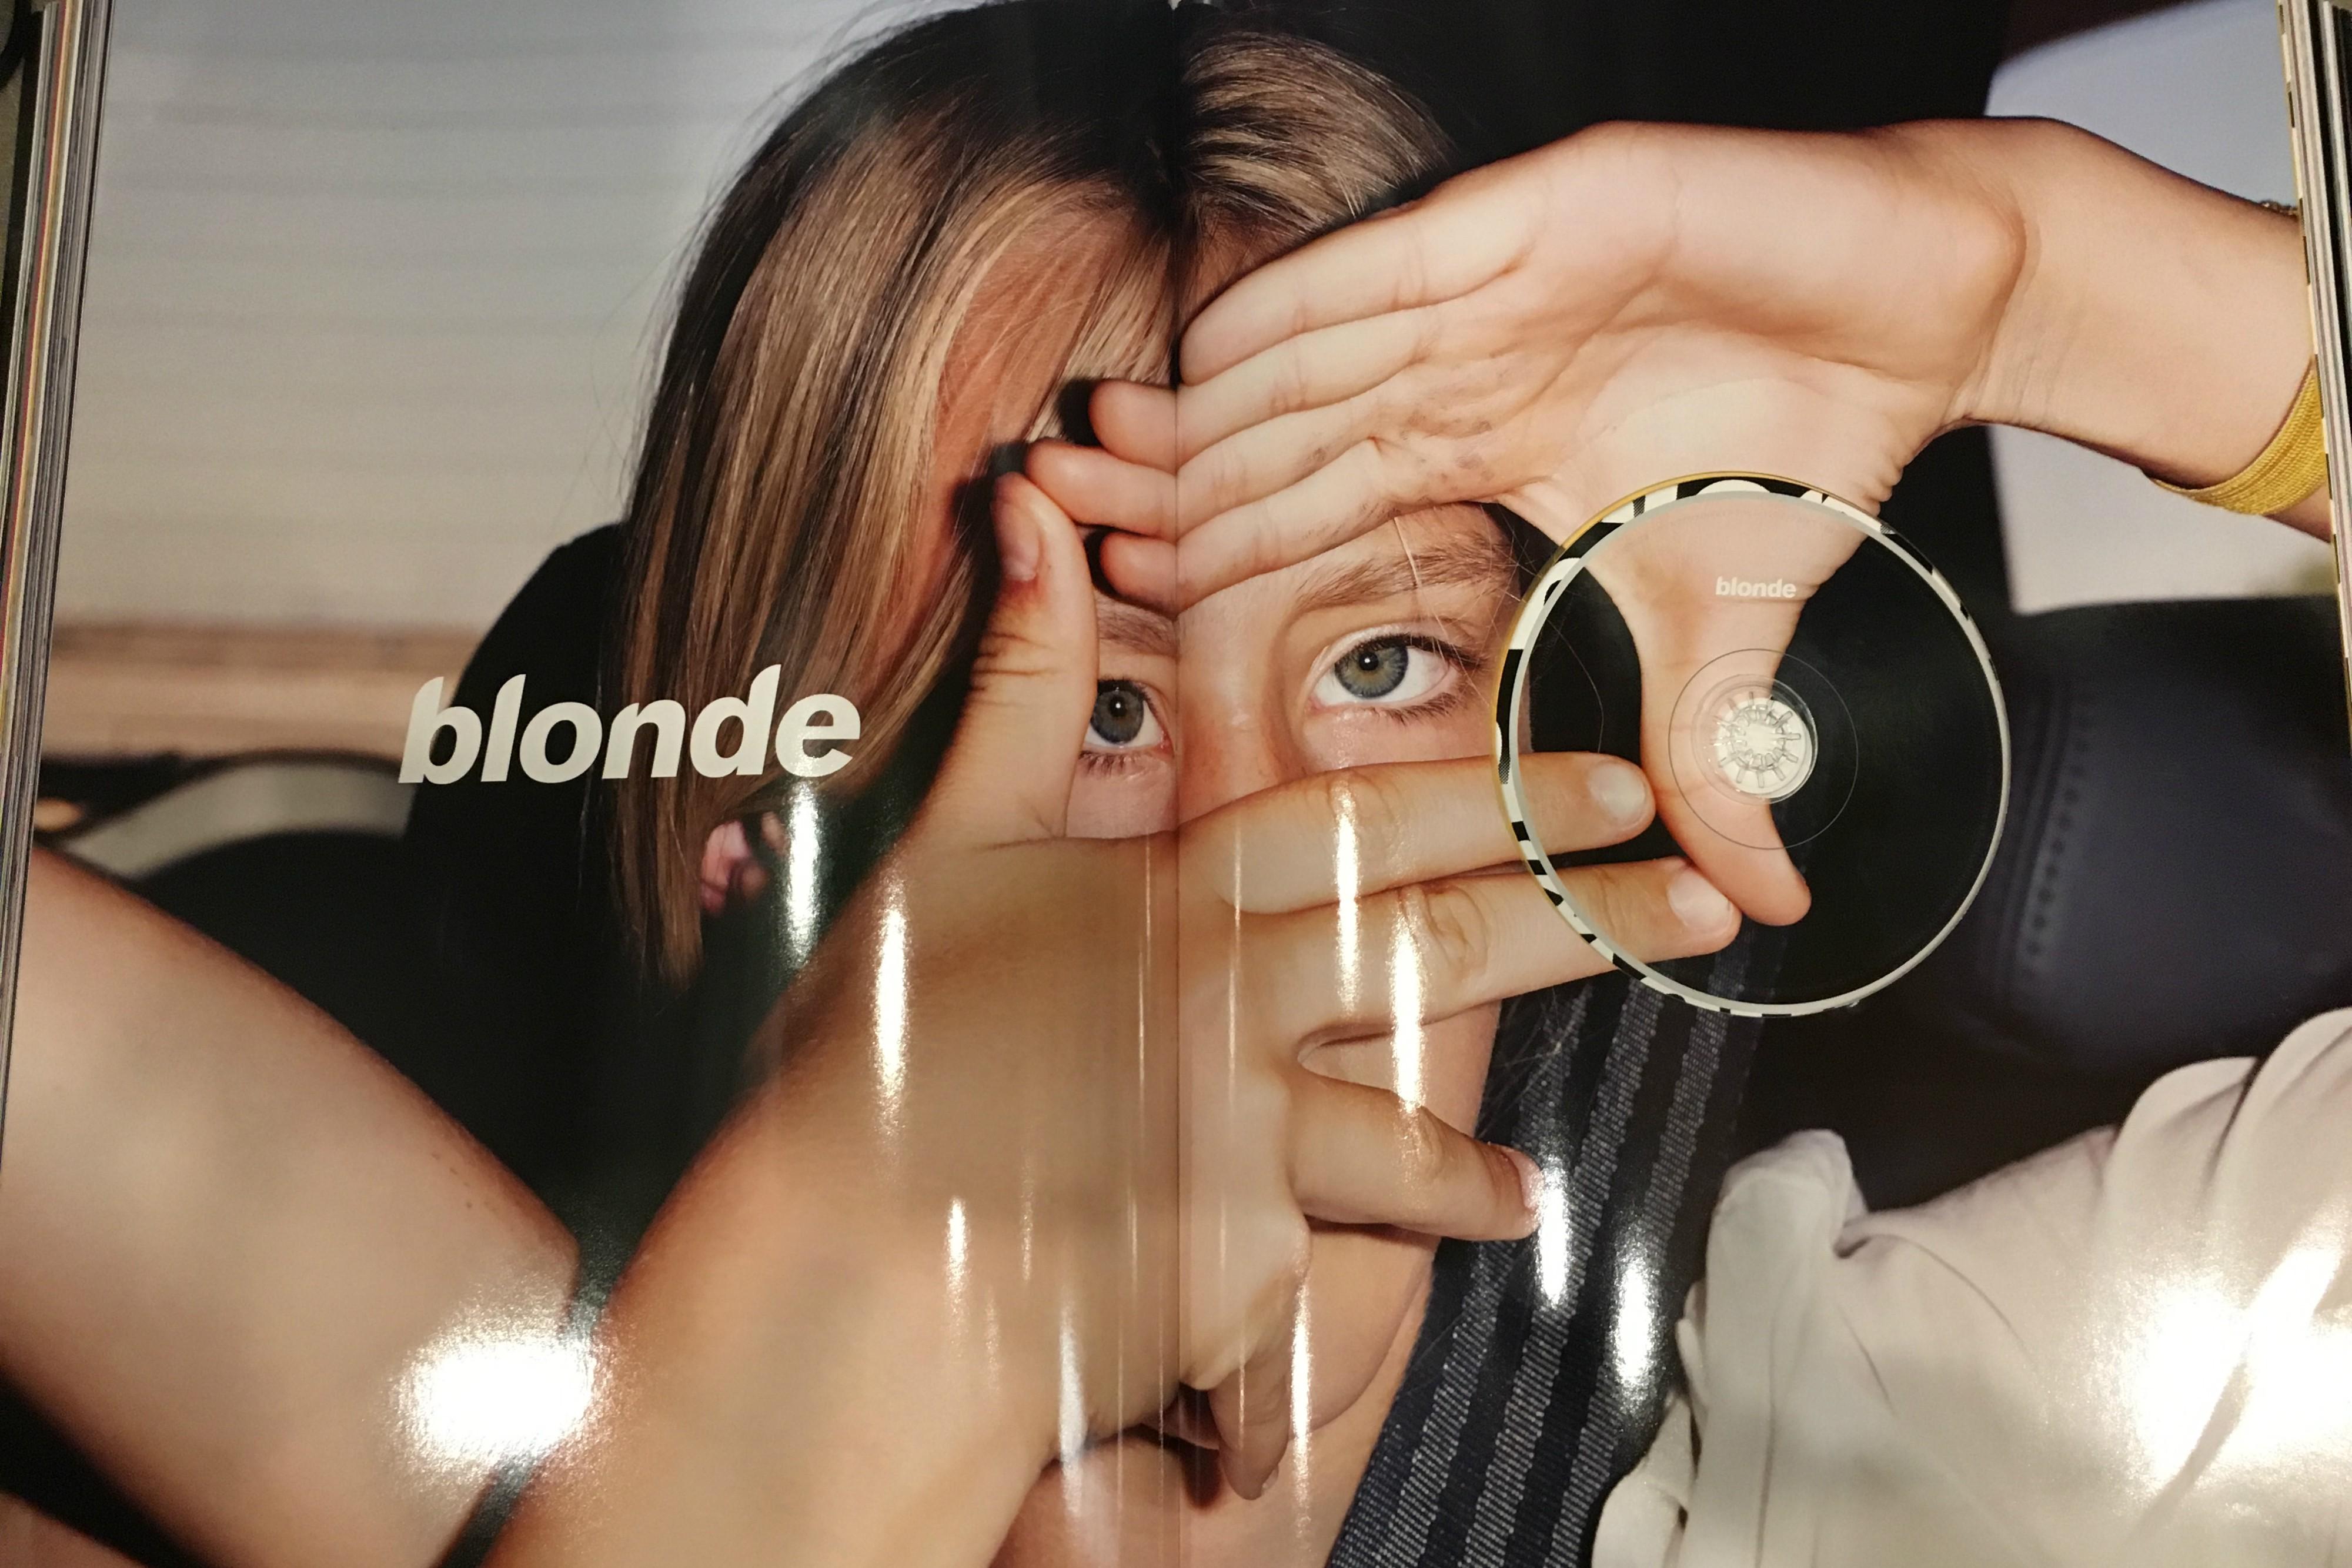 frank-ocean-blond-boys-dont-cry-kanye-west-mcdonalds-i-got-two-versions